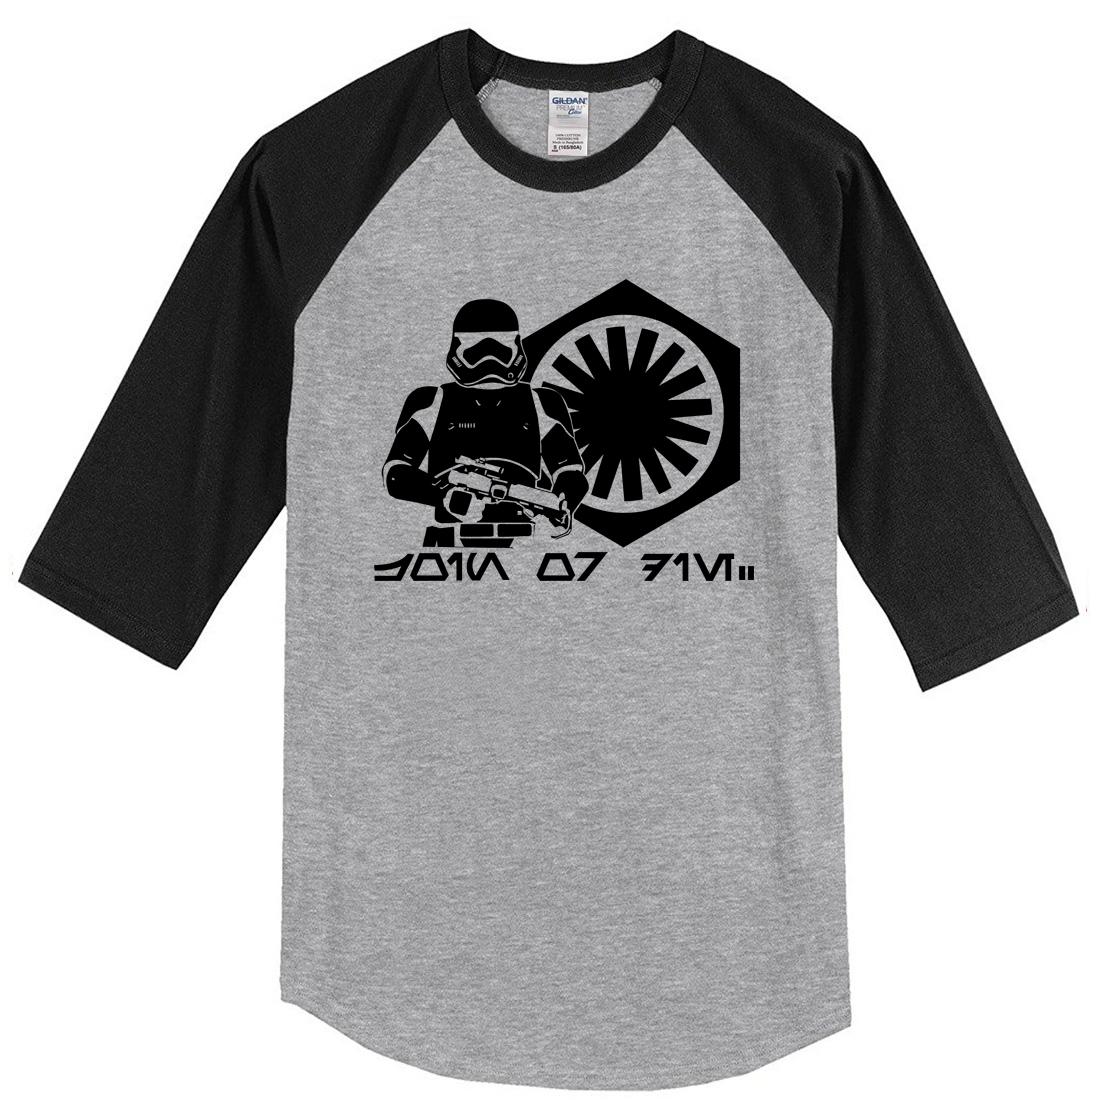 T-shirt uomo 2018 Primavera Estate New Fashion Three Quarter Sleeve T Shirt di marca uomo Harajuku Hip Hop Top Tshirt Uomo Casual